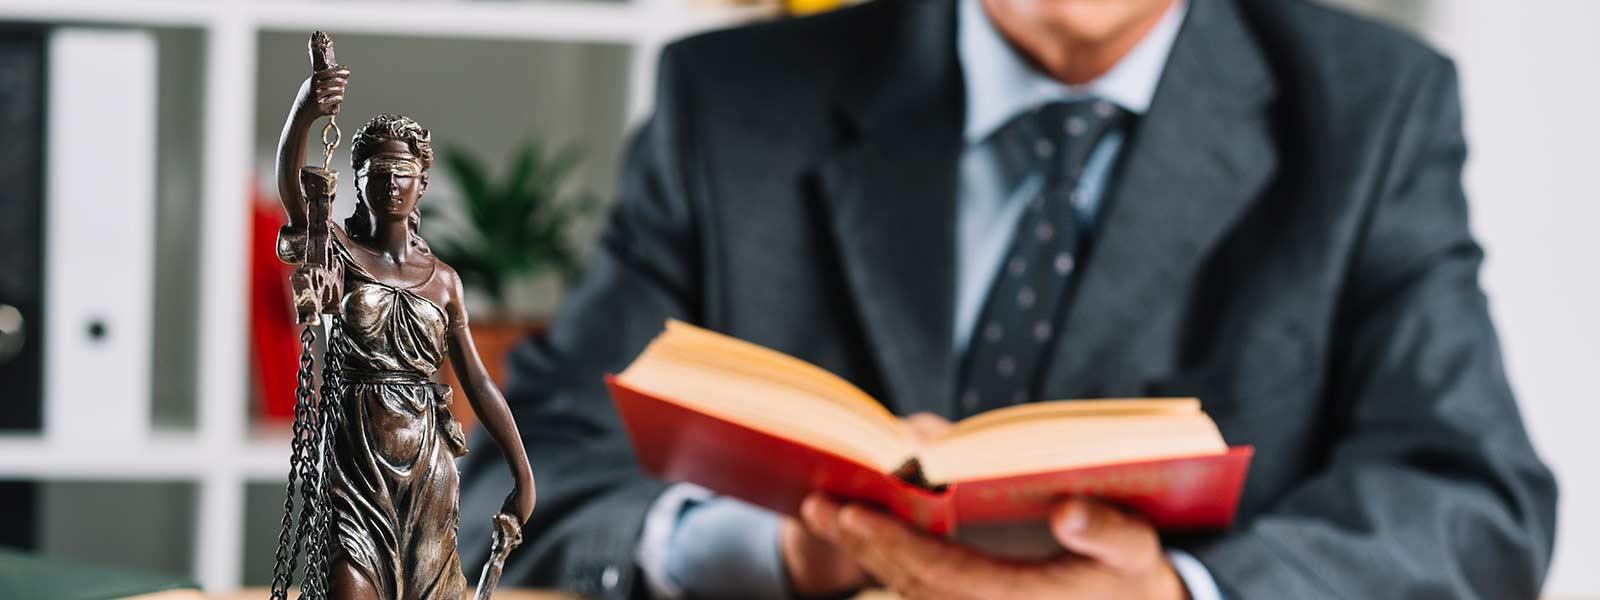 Абонентське юридичне обслуговування